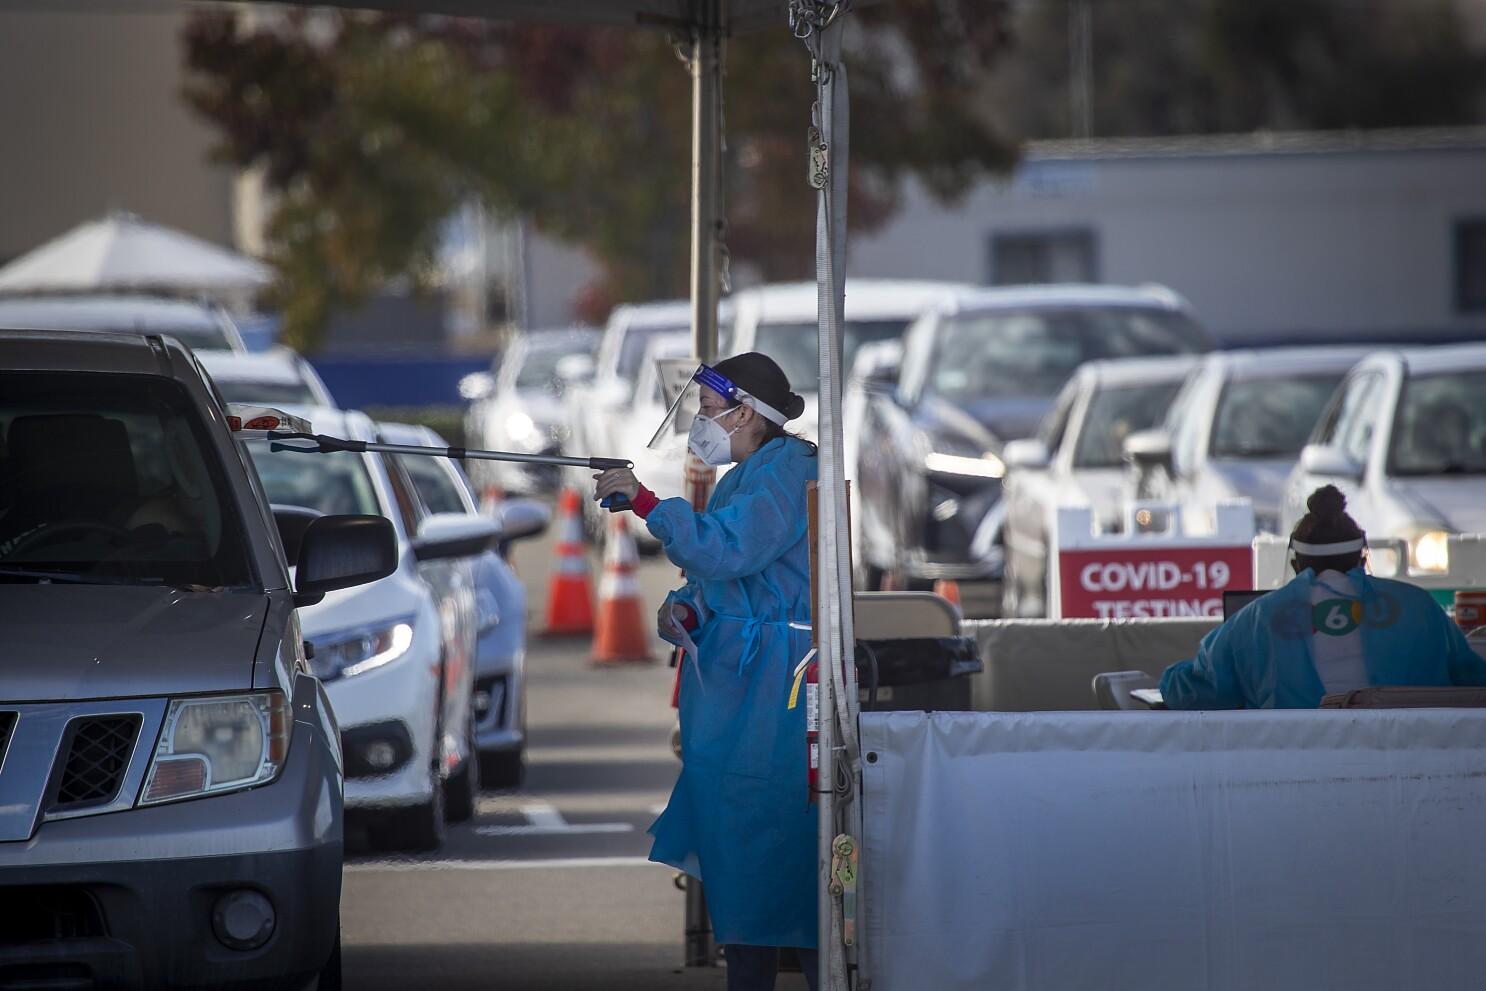 California Coronavirus Surge Prompts Pleas To Avoid Travel Los Angeles Times